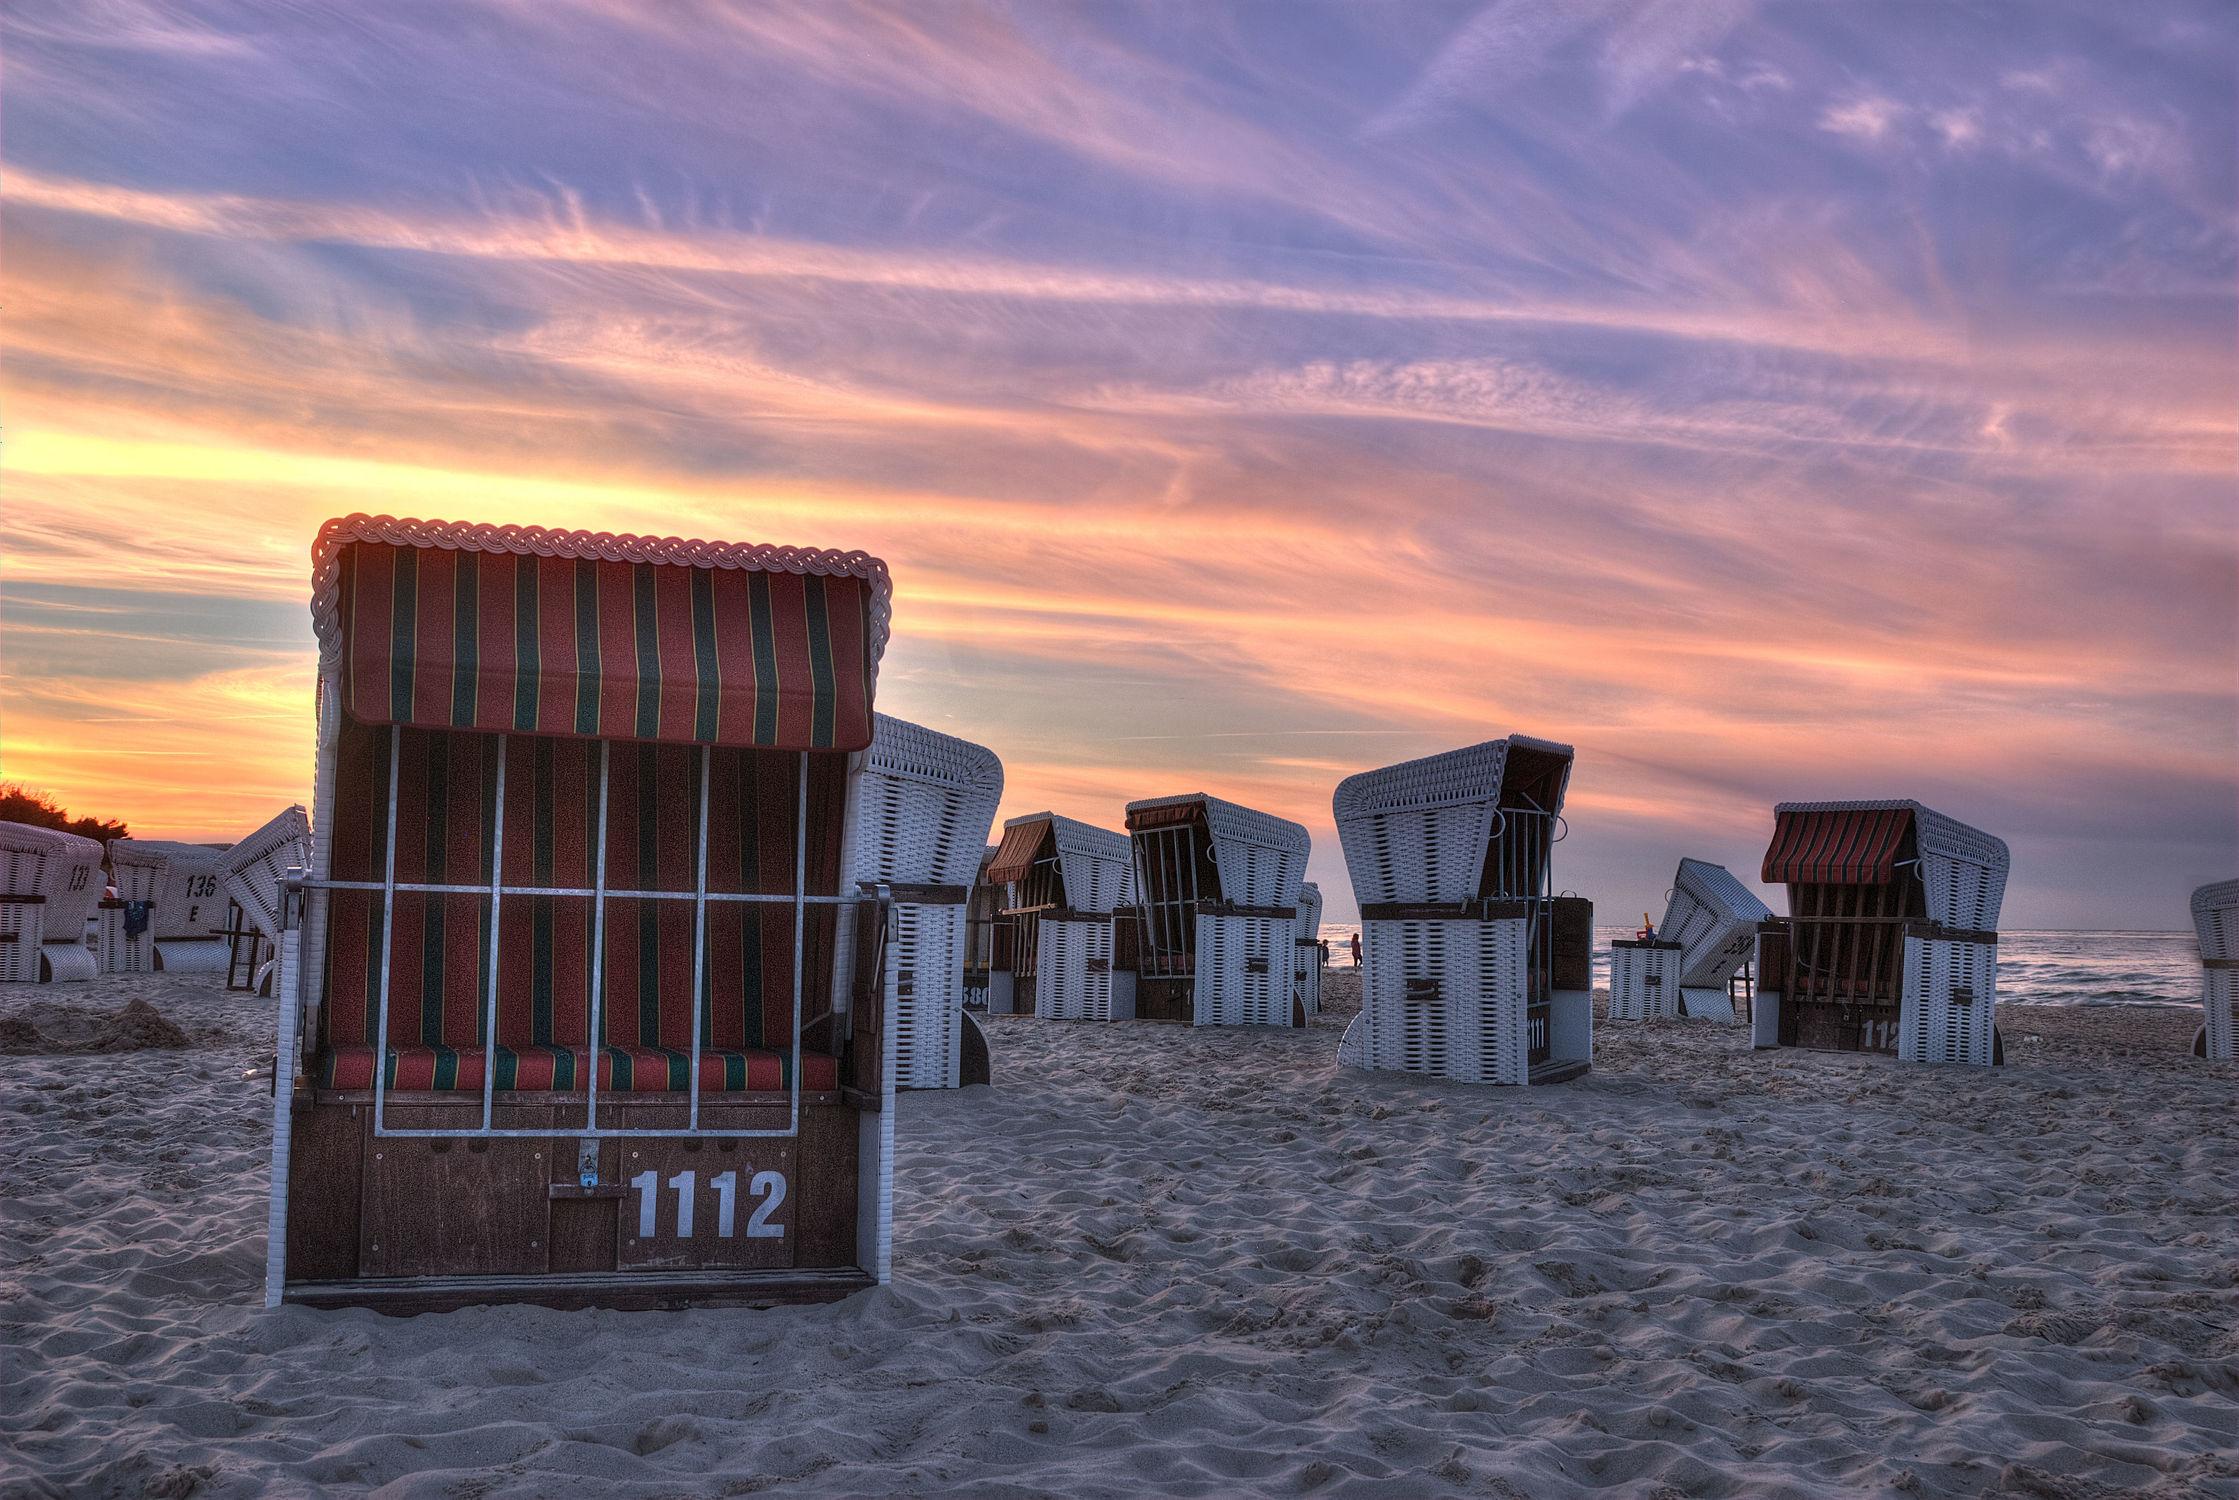 Bild mit Gewässer, Sonnenuntergang, Sonnenaufgang, Strand, Sandstrand, Strandkörbe, Ostsee, Meer, Strandkorb, Am Meer